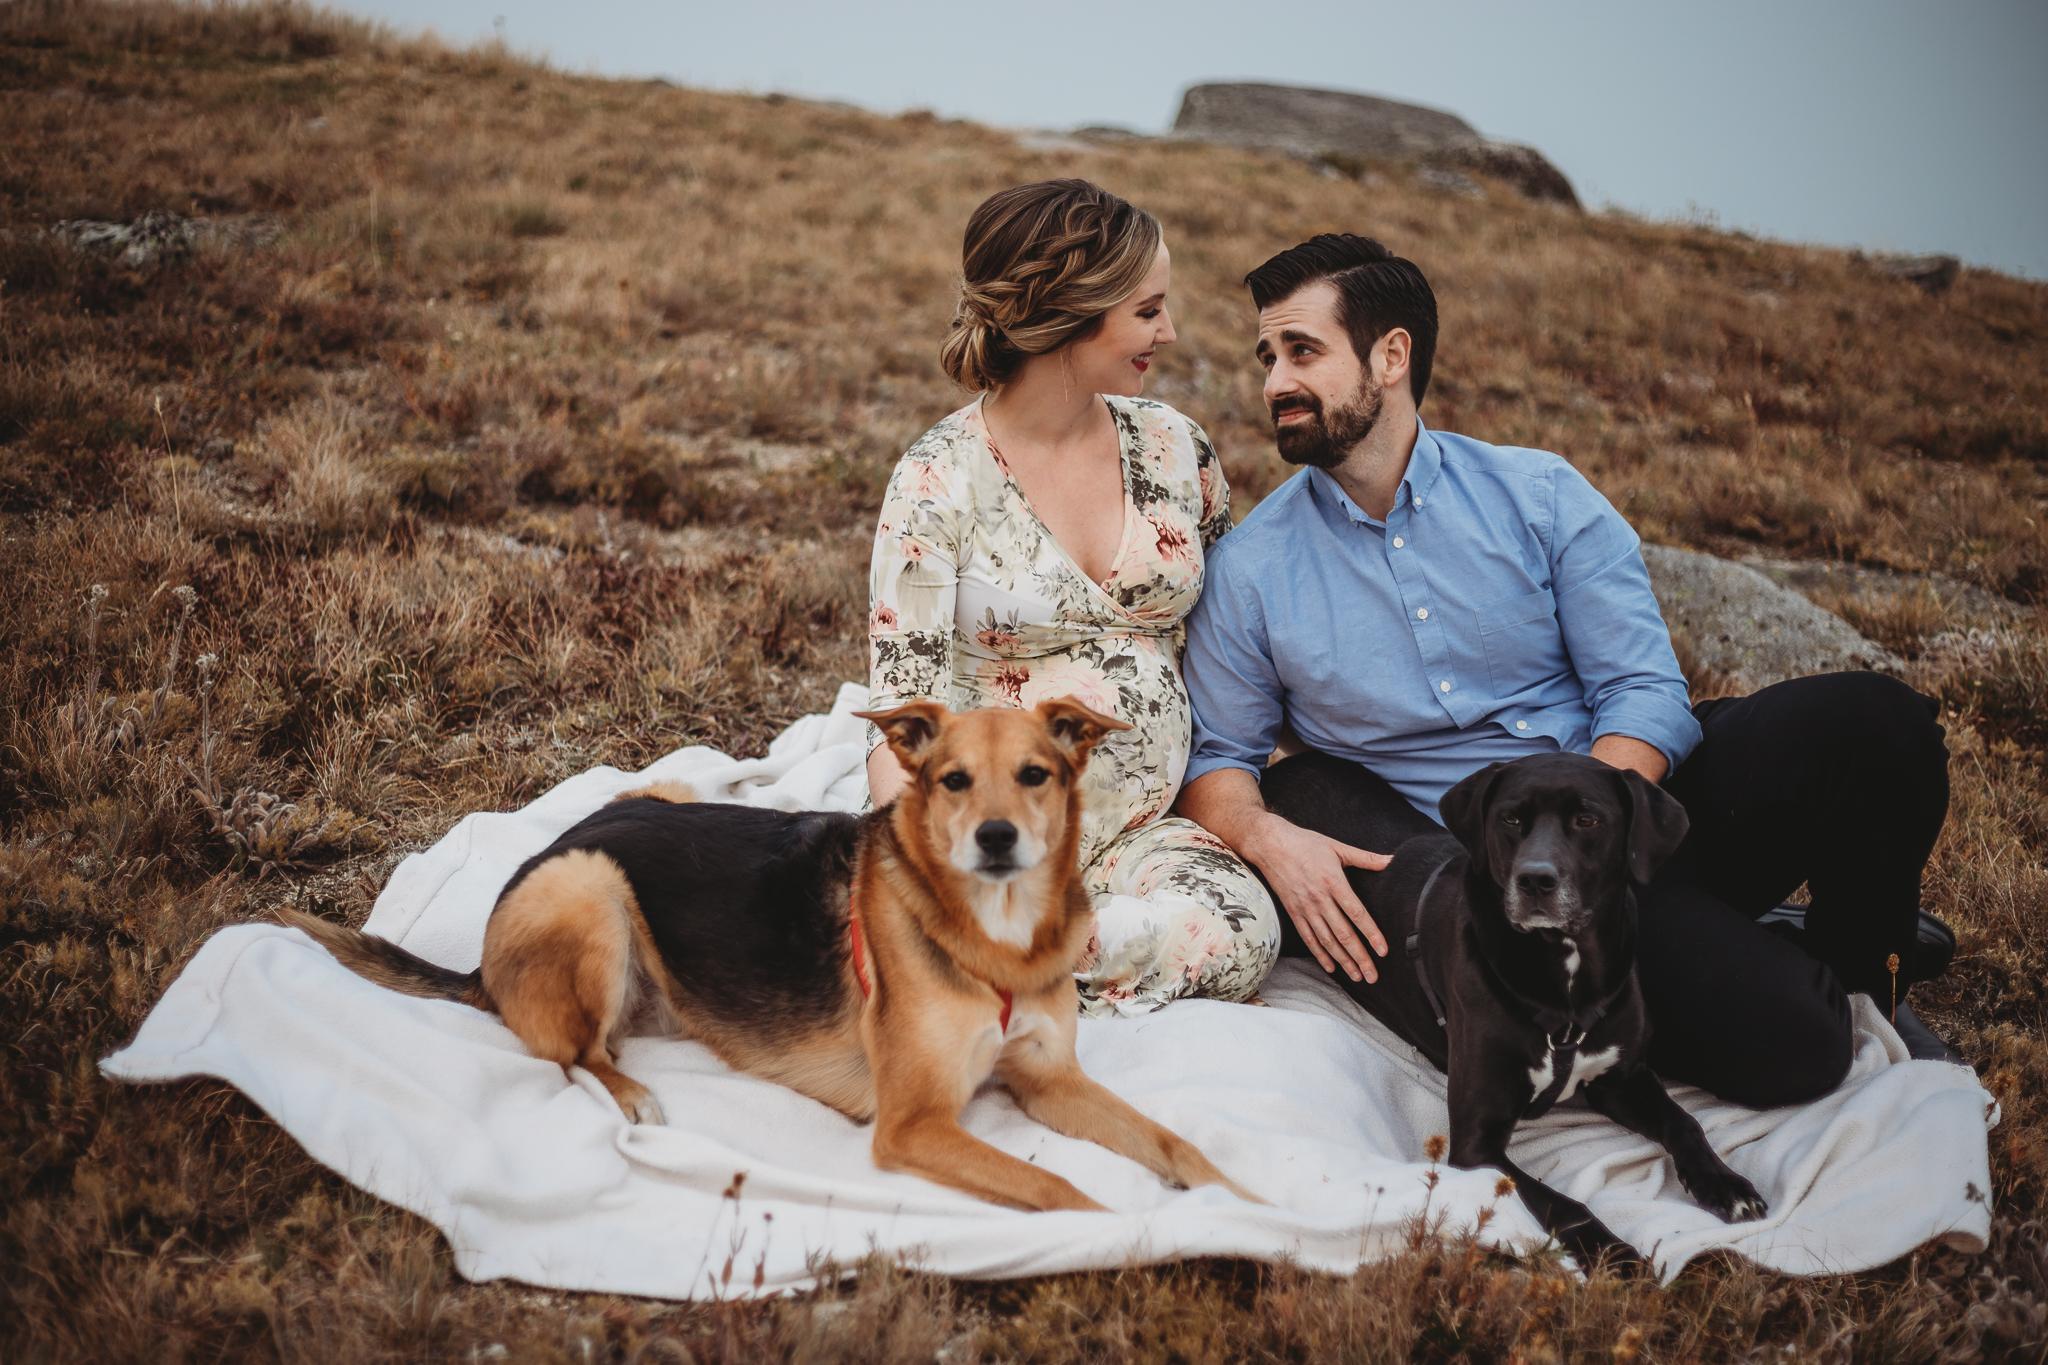 Spokane Maternity Photography